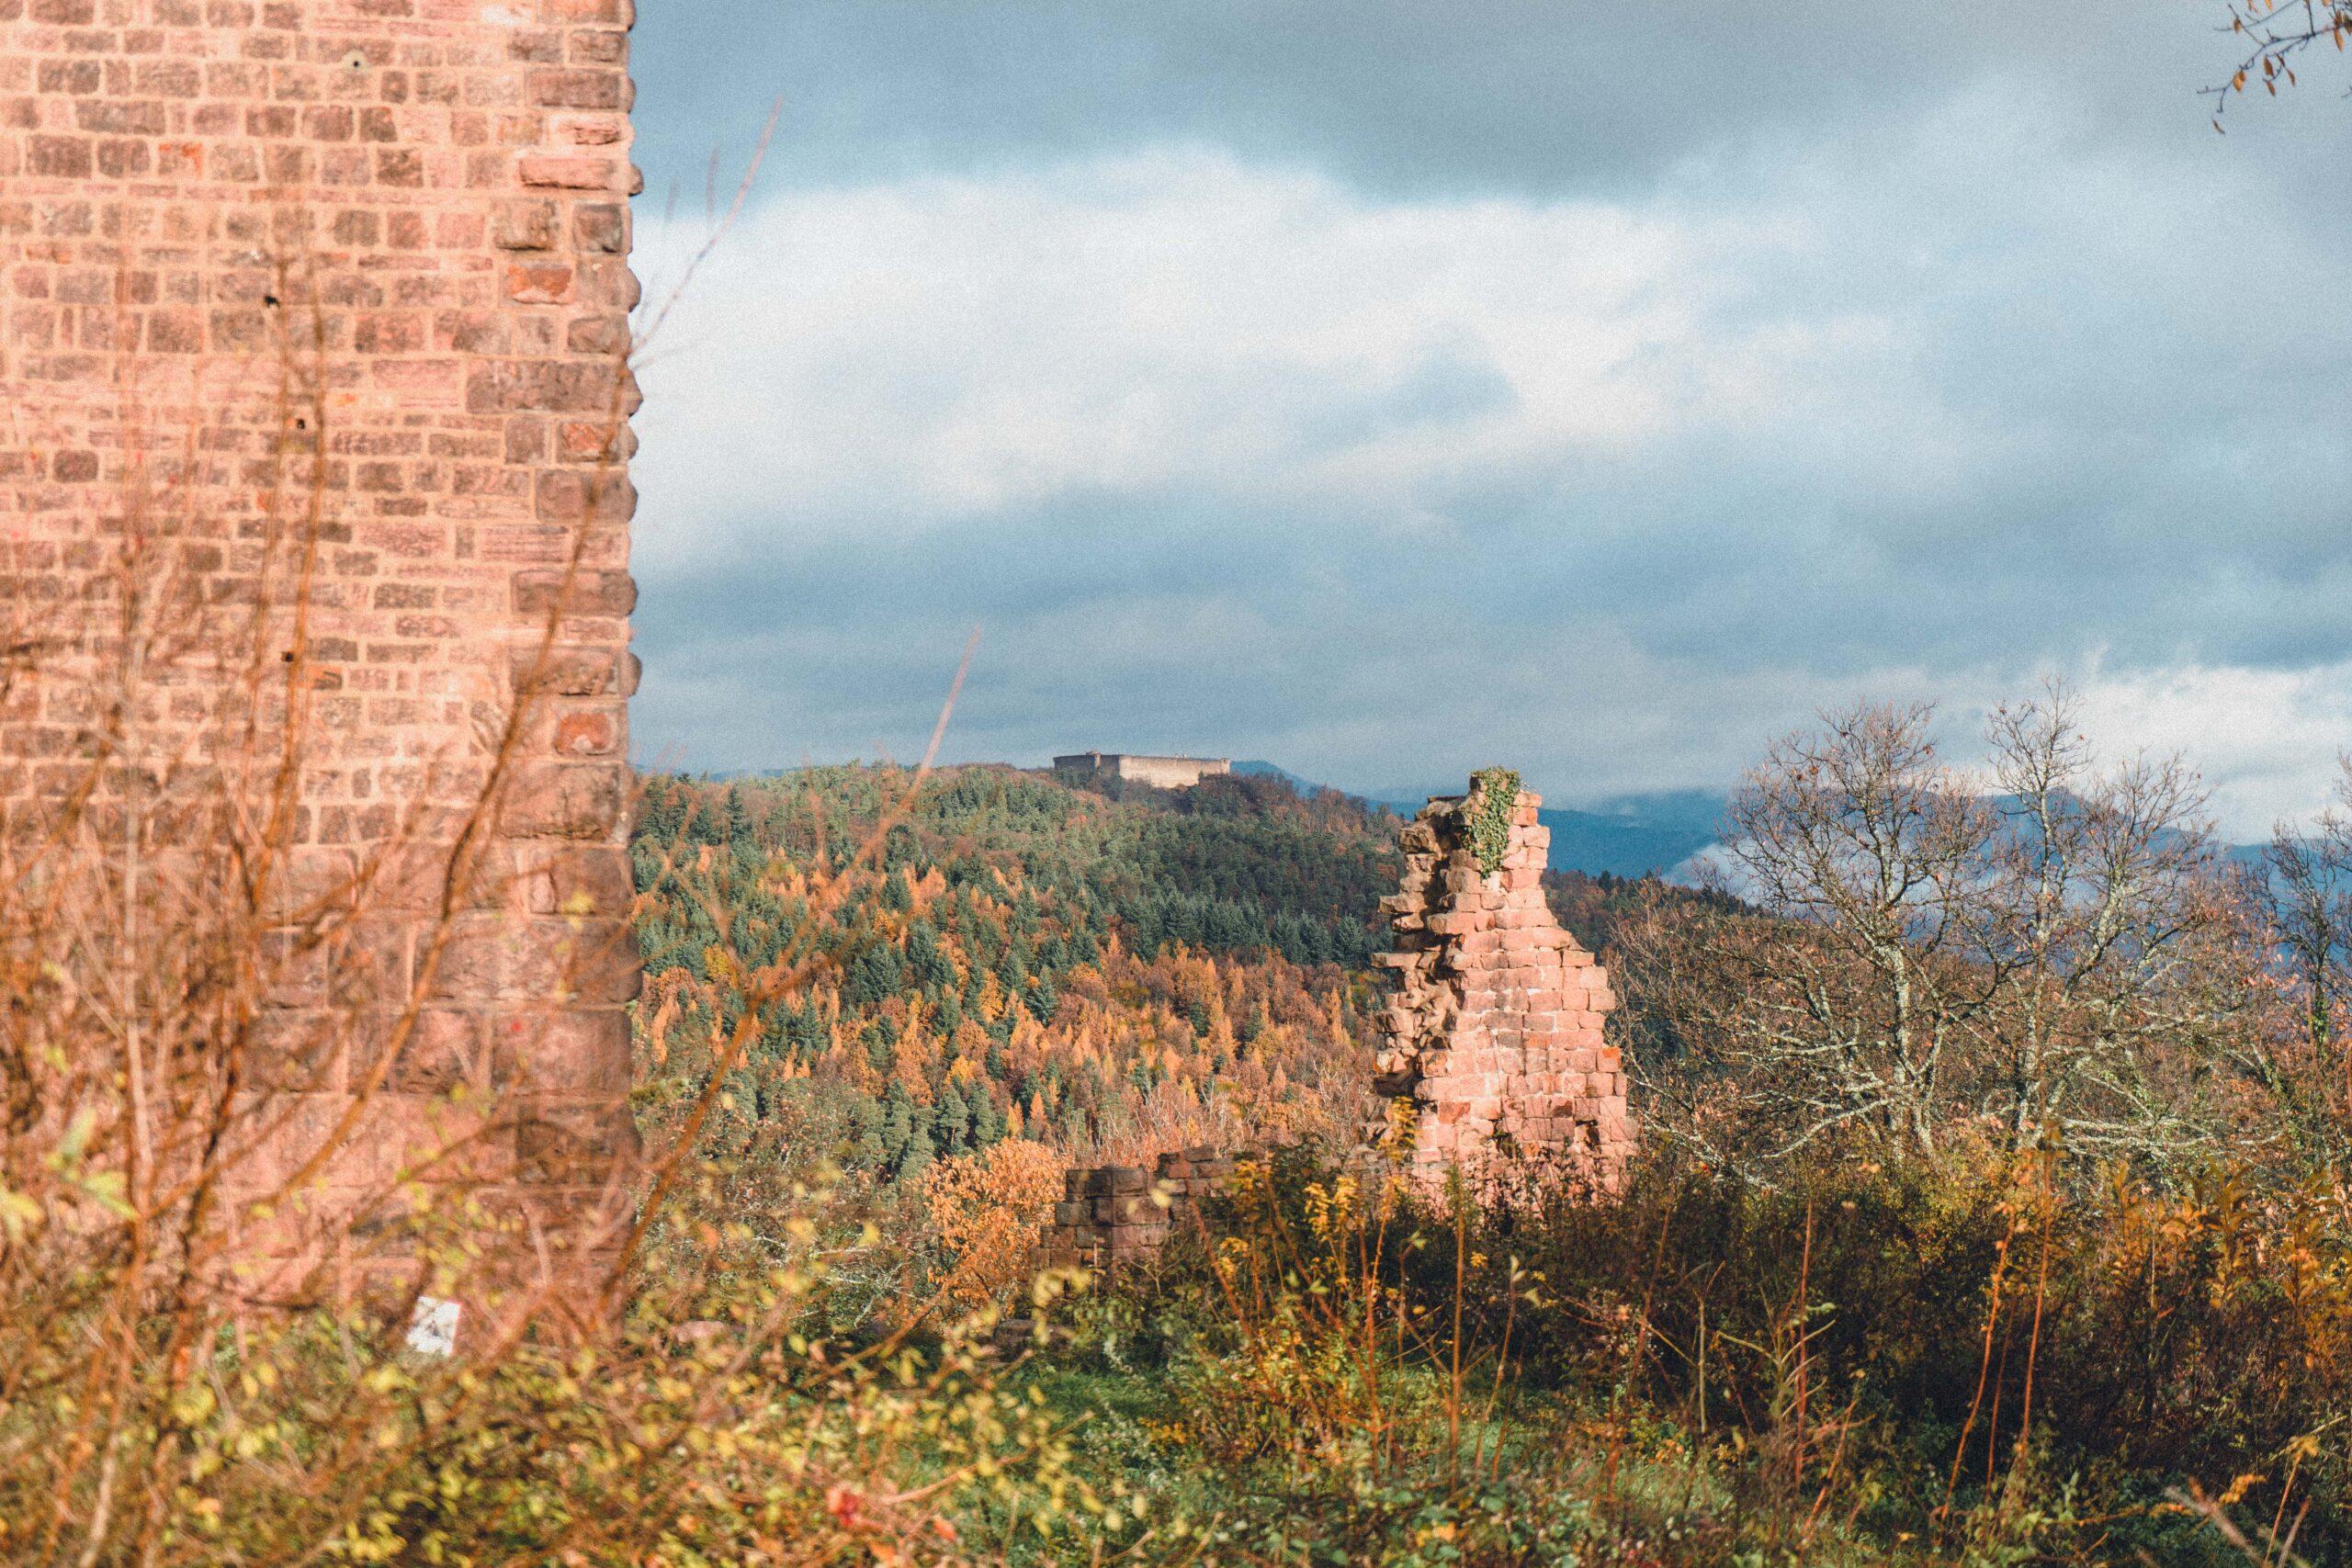 A Guide to Visiting the Three Castles of Eguisheim (Les Trois Châteaux du Haut-Eguisheim), Alsace, France)